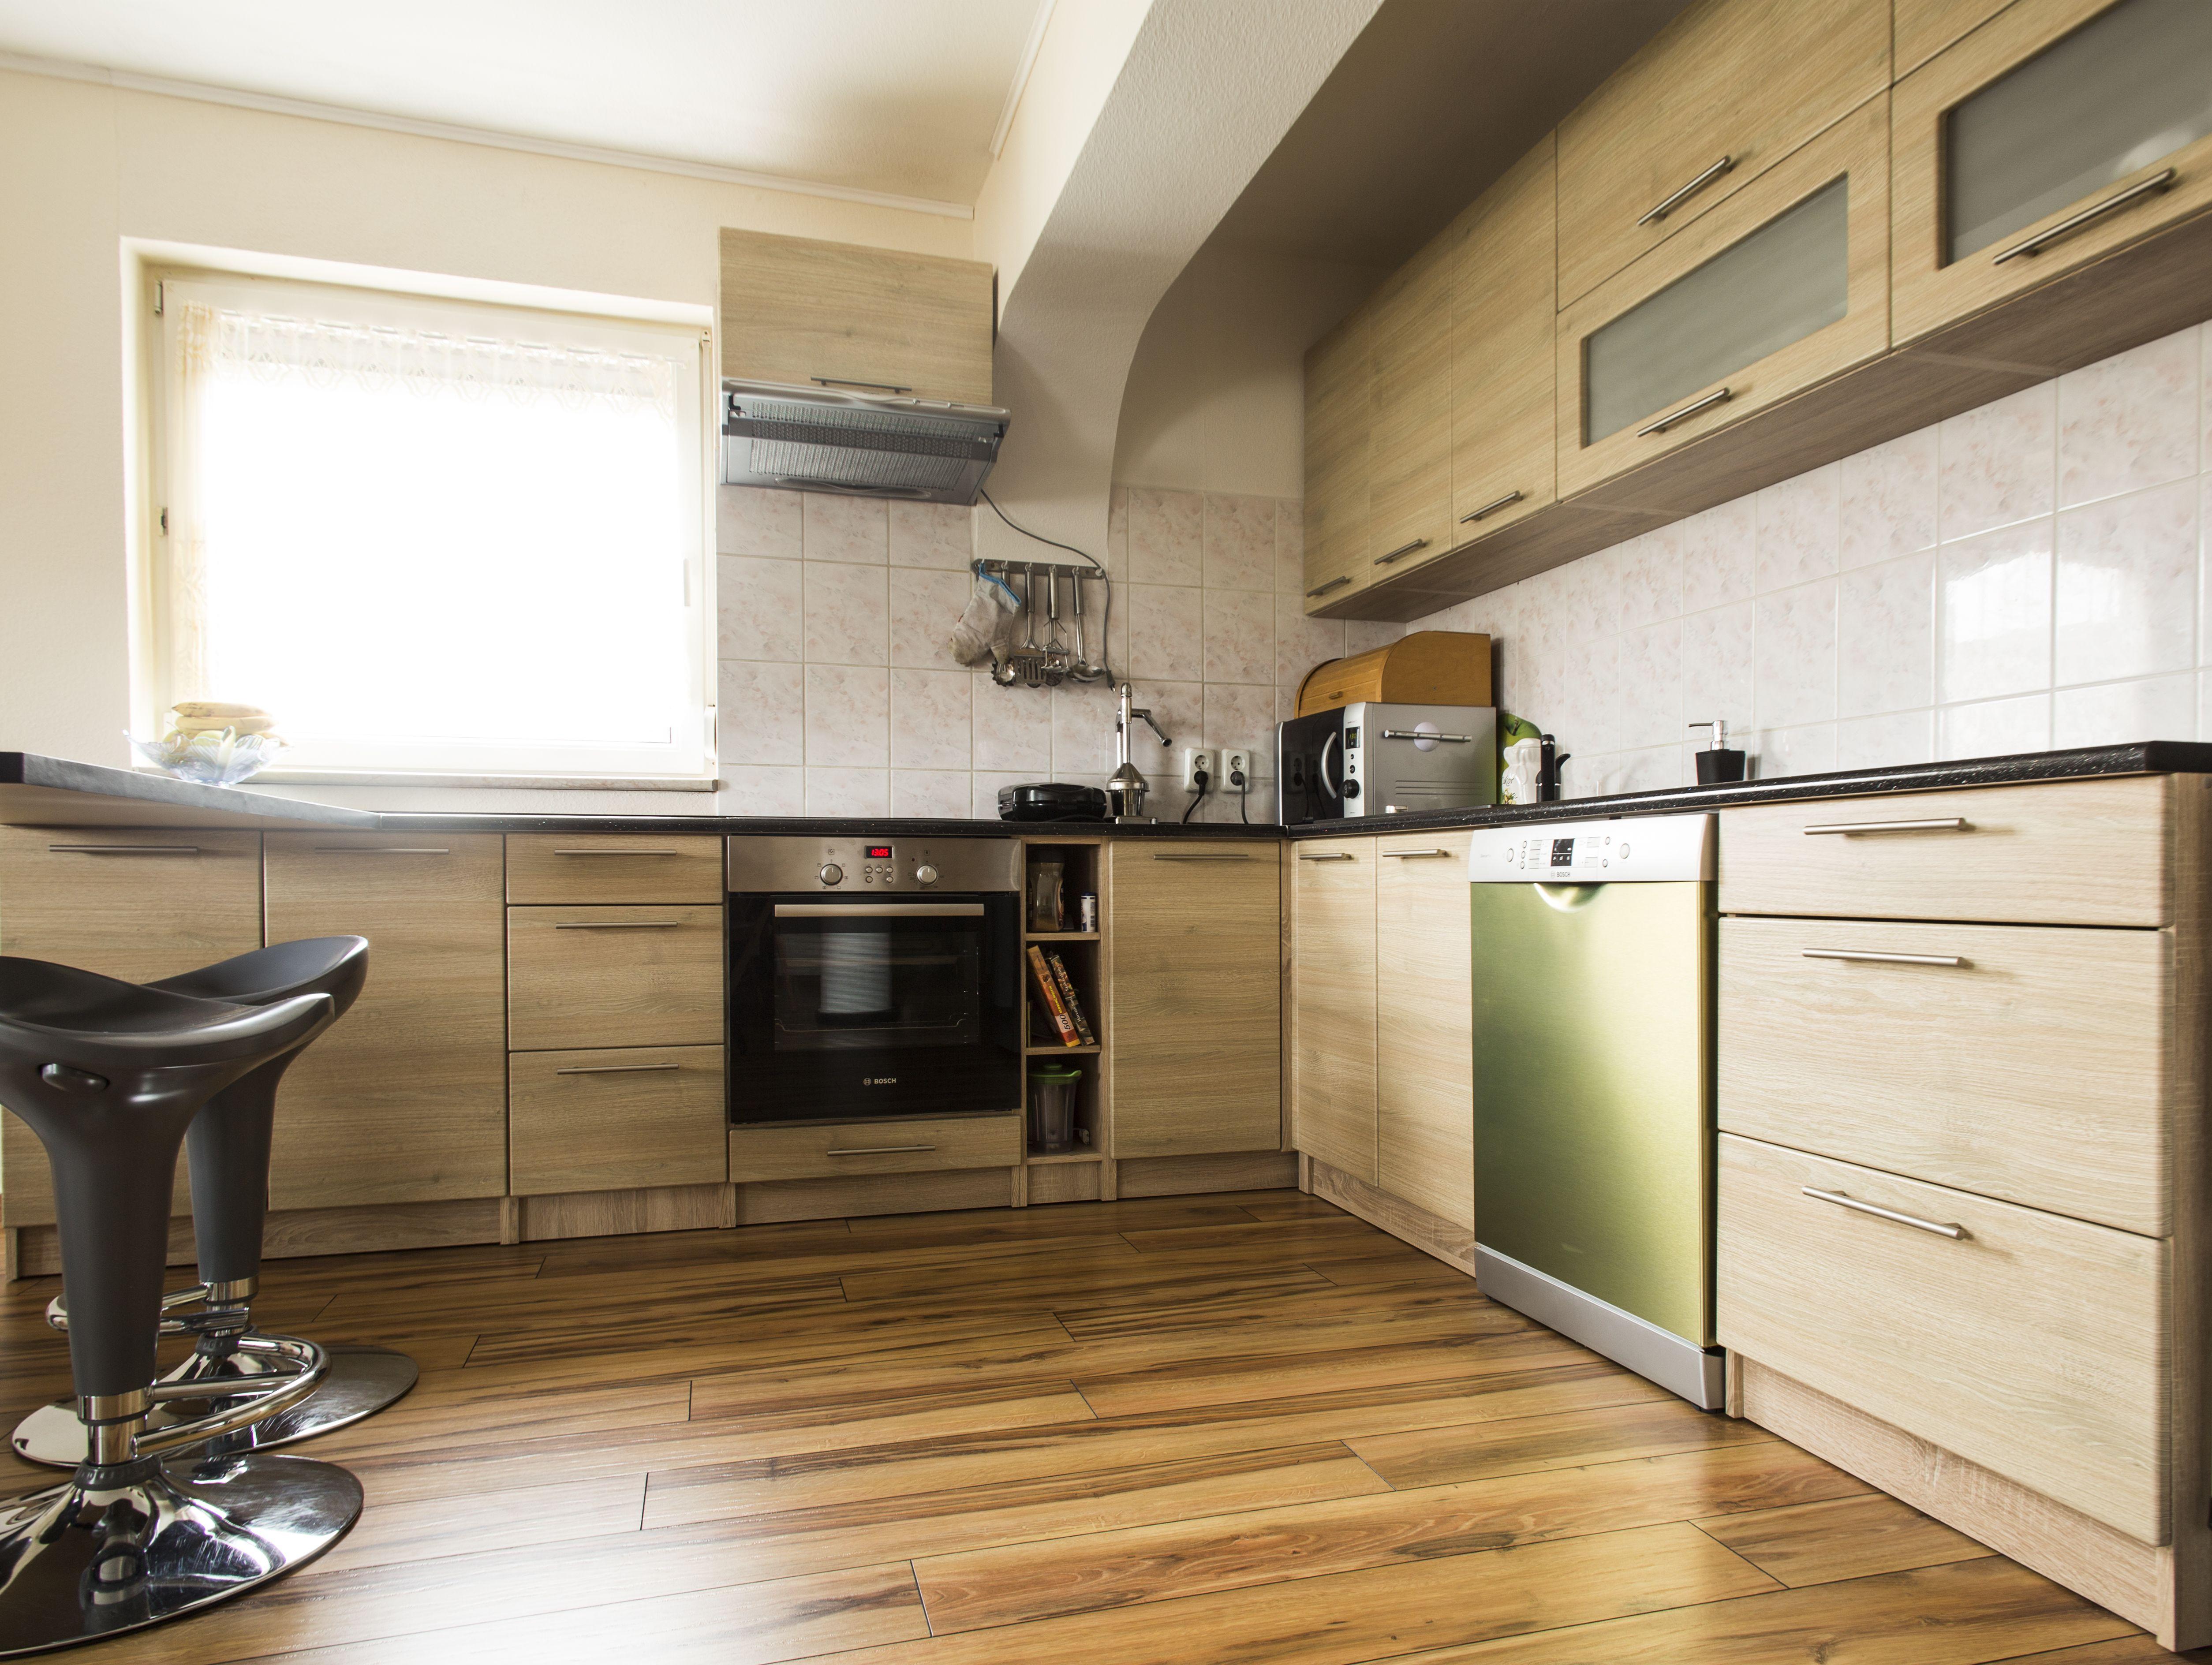 Bulthaup Küchenrollenhalter ~ 12 best küche images on pinterest kitchen dining rooms simple